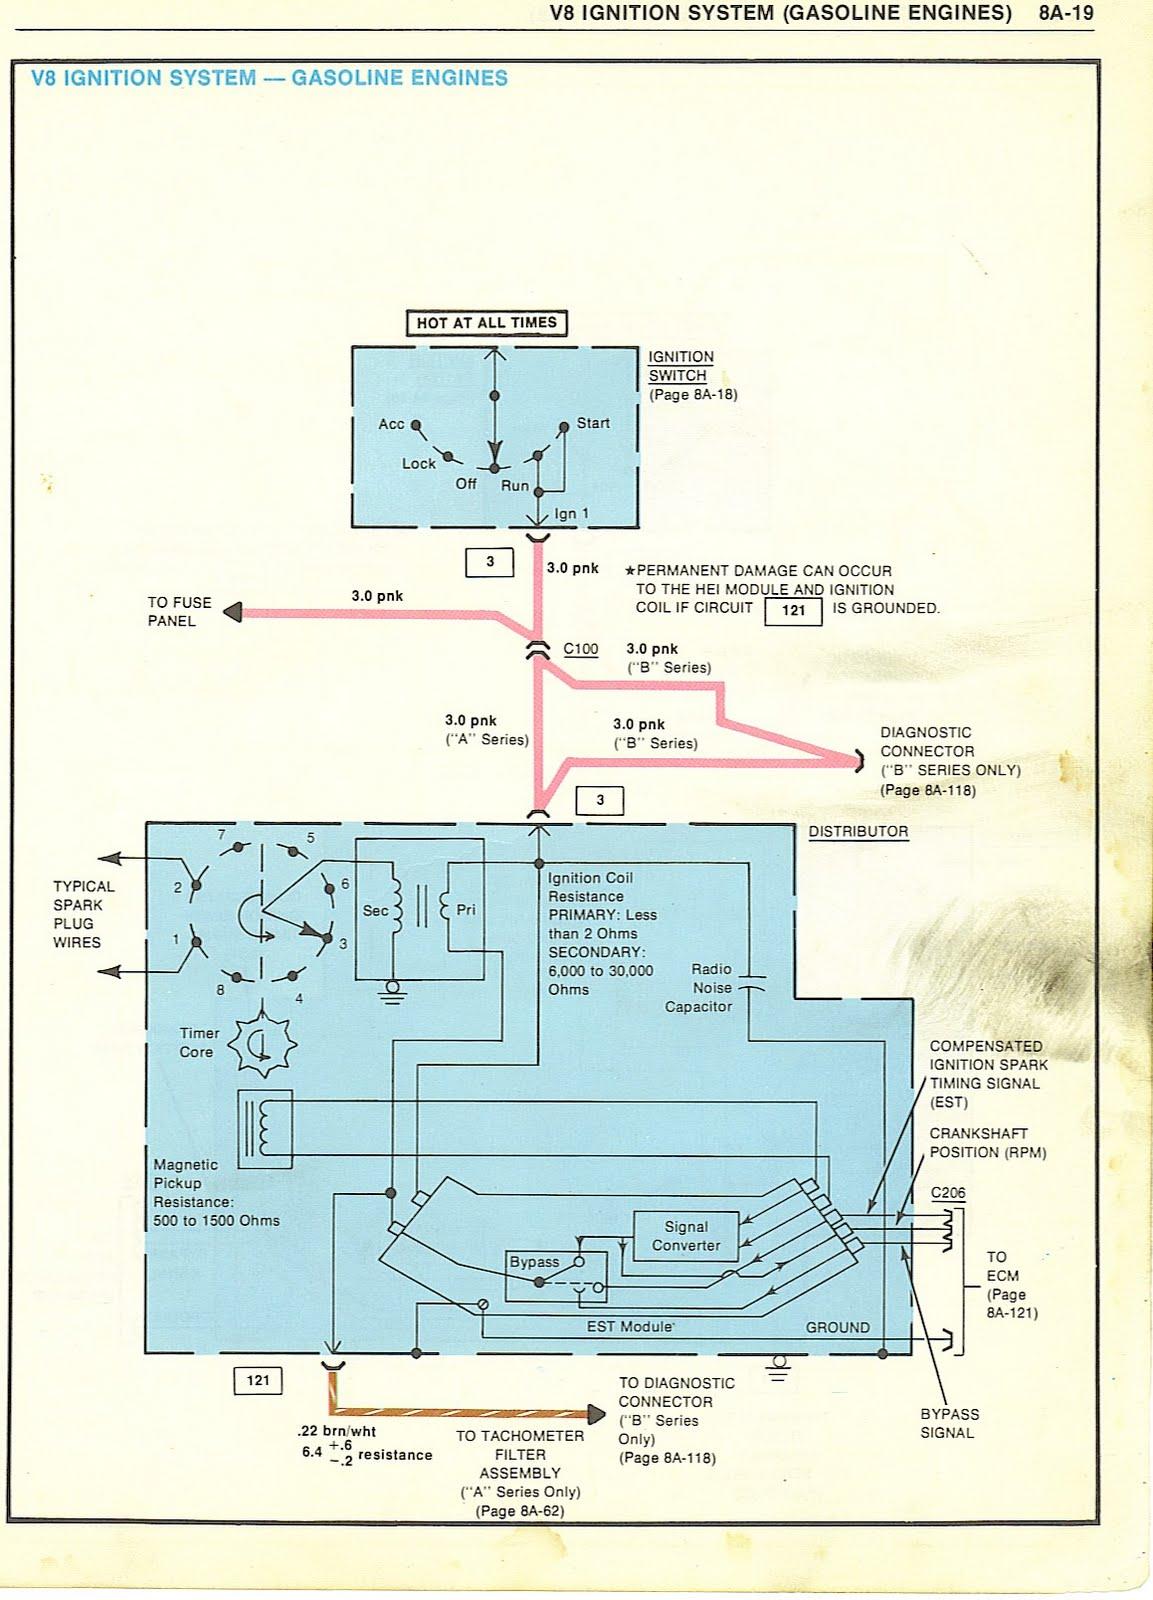 1967 Camaro Fuel Gauge Wiring Diagram Free Auto Wiring Diagram Chevrolet Malibu V8 Ignition